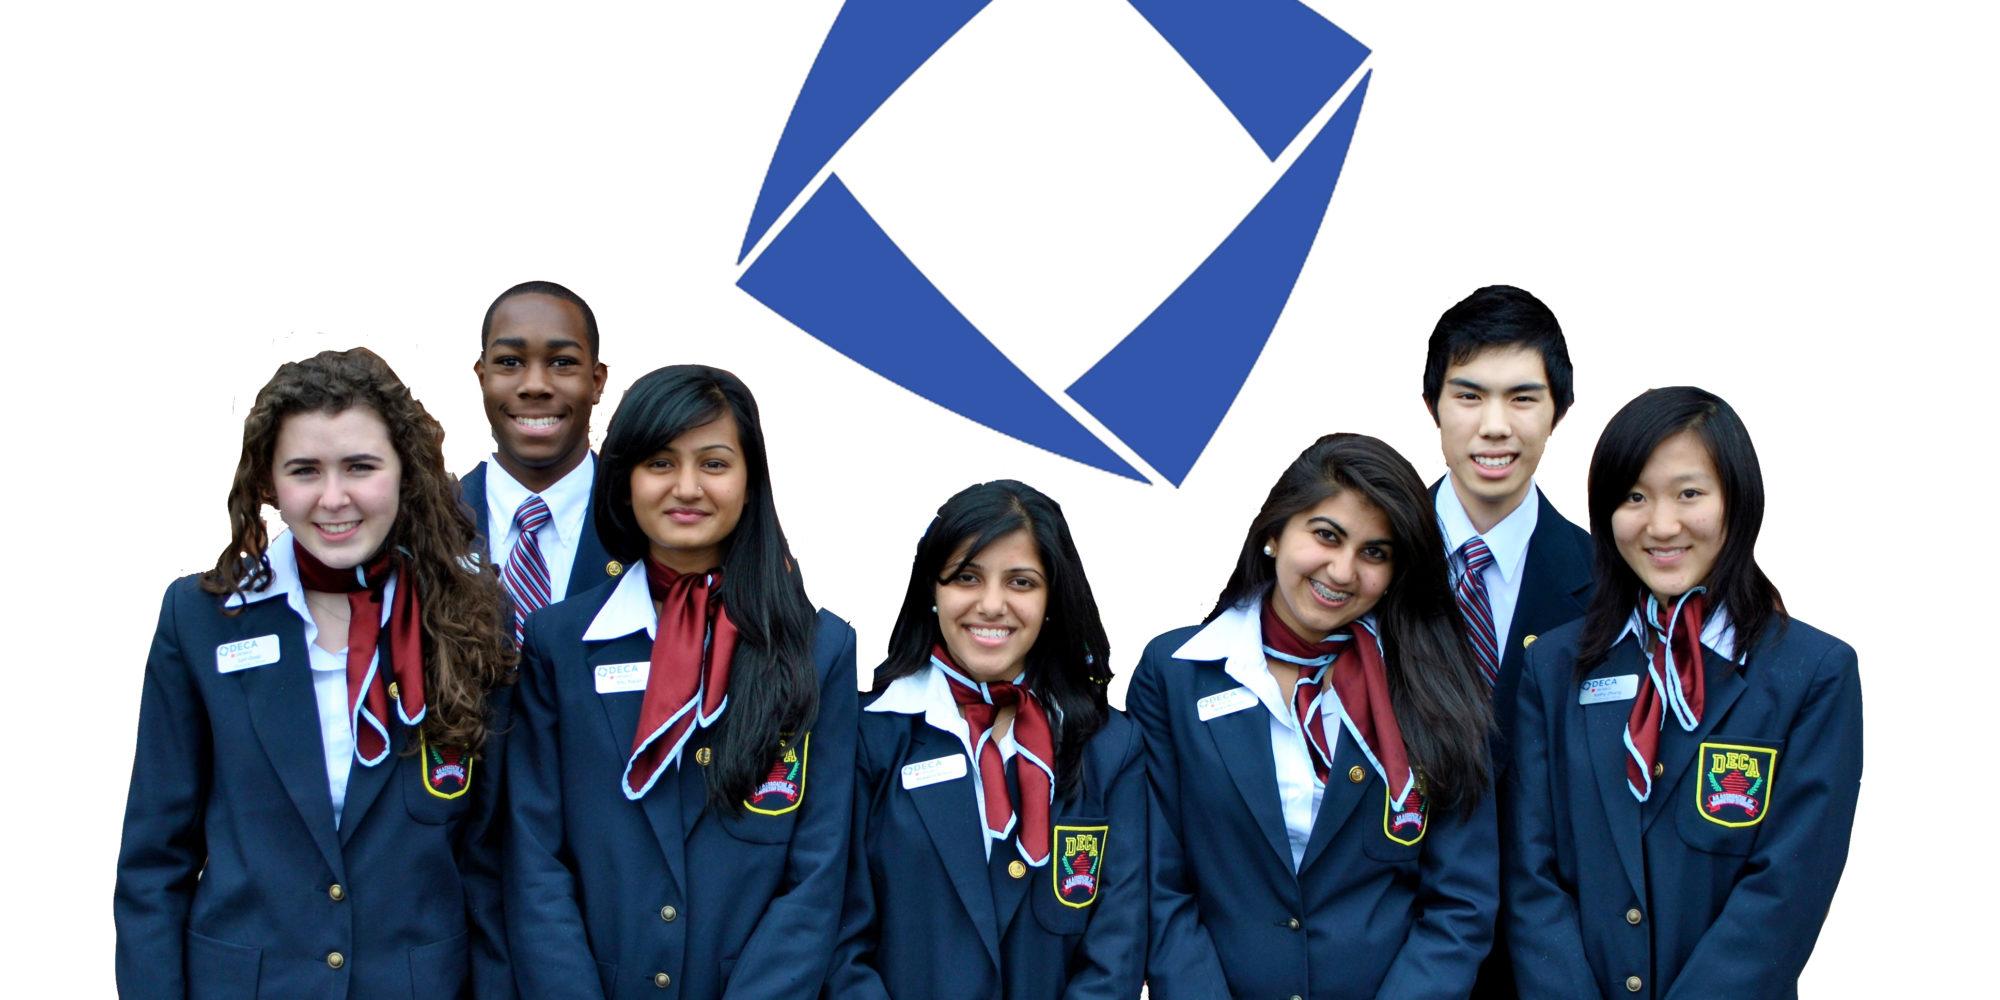 2010-2011 Officer Team